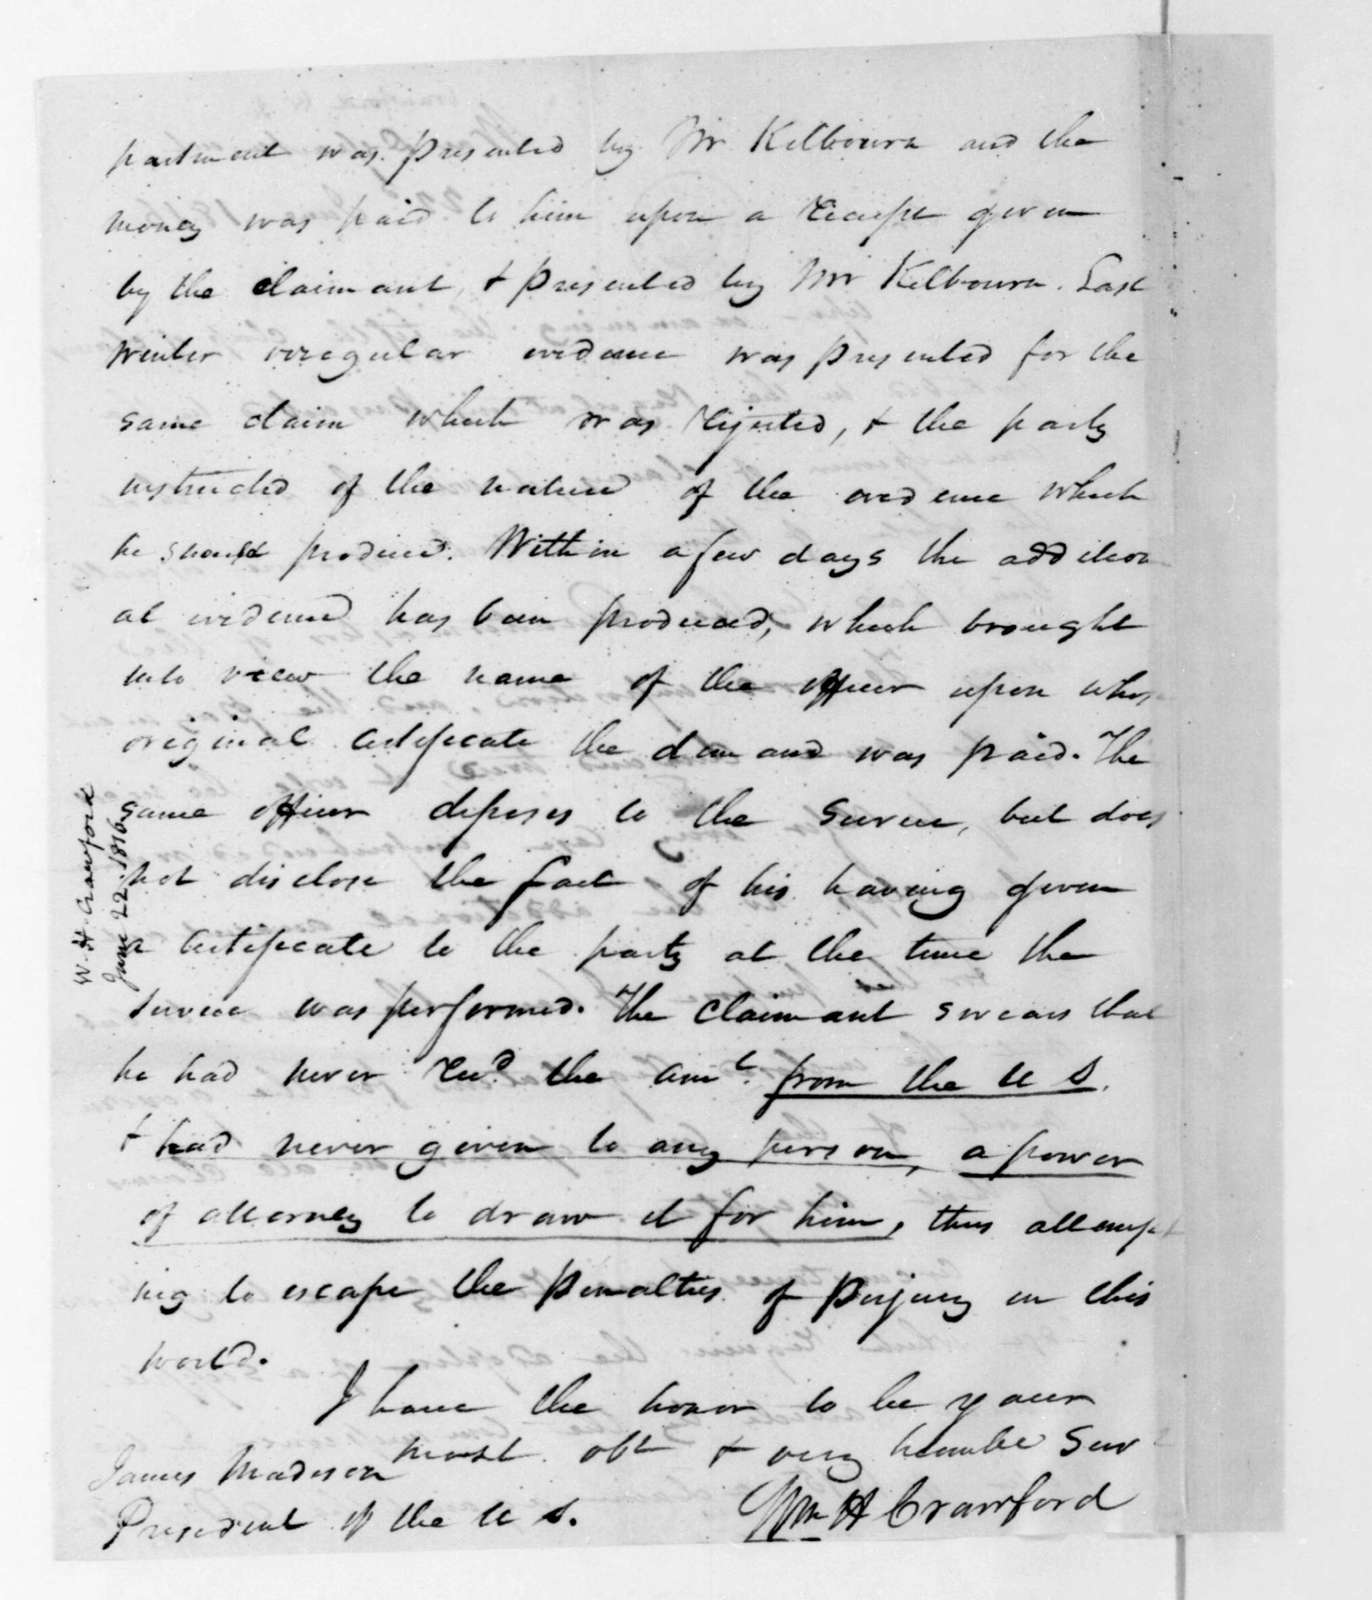 William H. Crawford to James Madison, June 22, 1816.